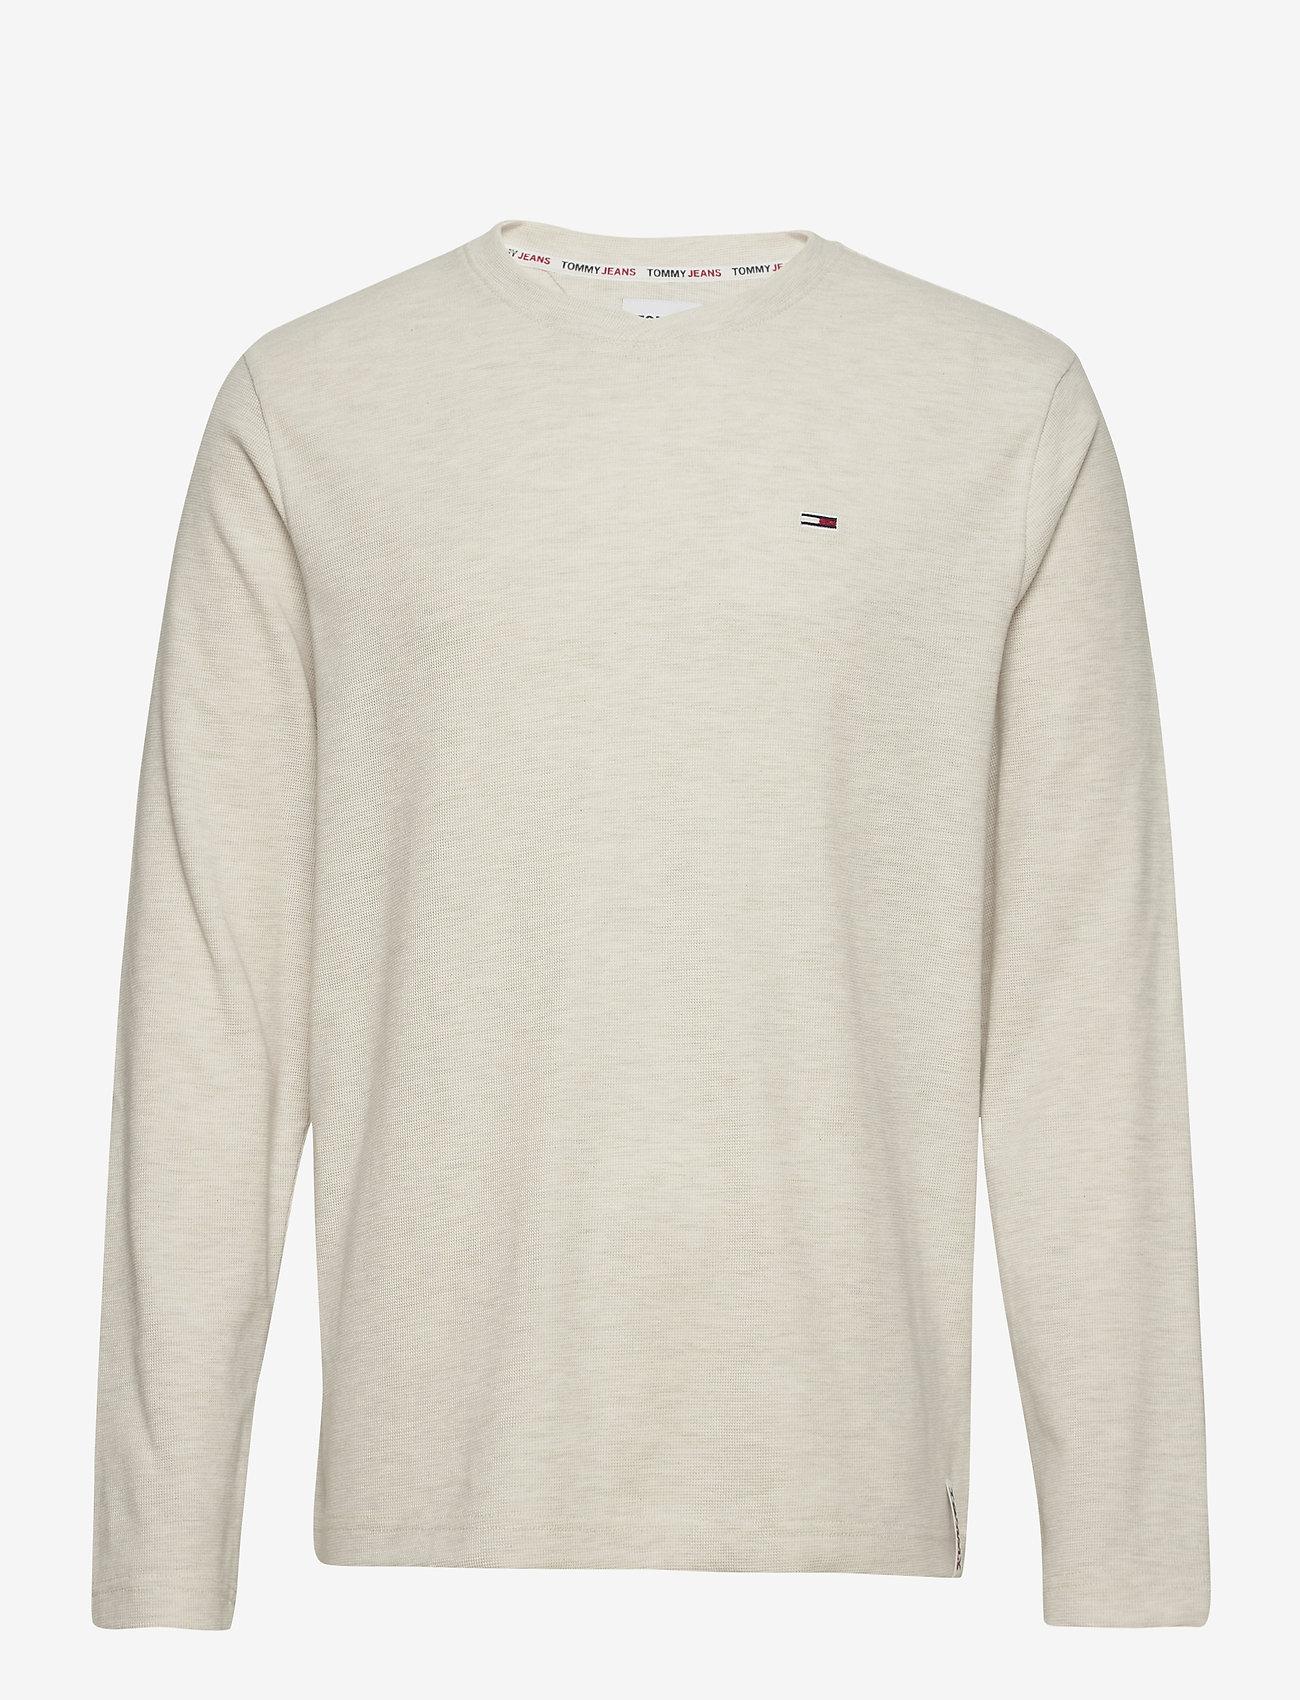 Tommy Jeans - TJM MINI WAFFLE JASPE LONGSLEEVE - basic t-shirts - white htr - 0